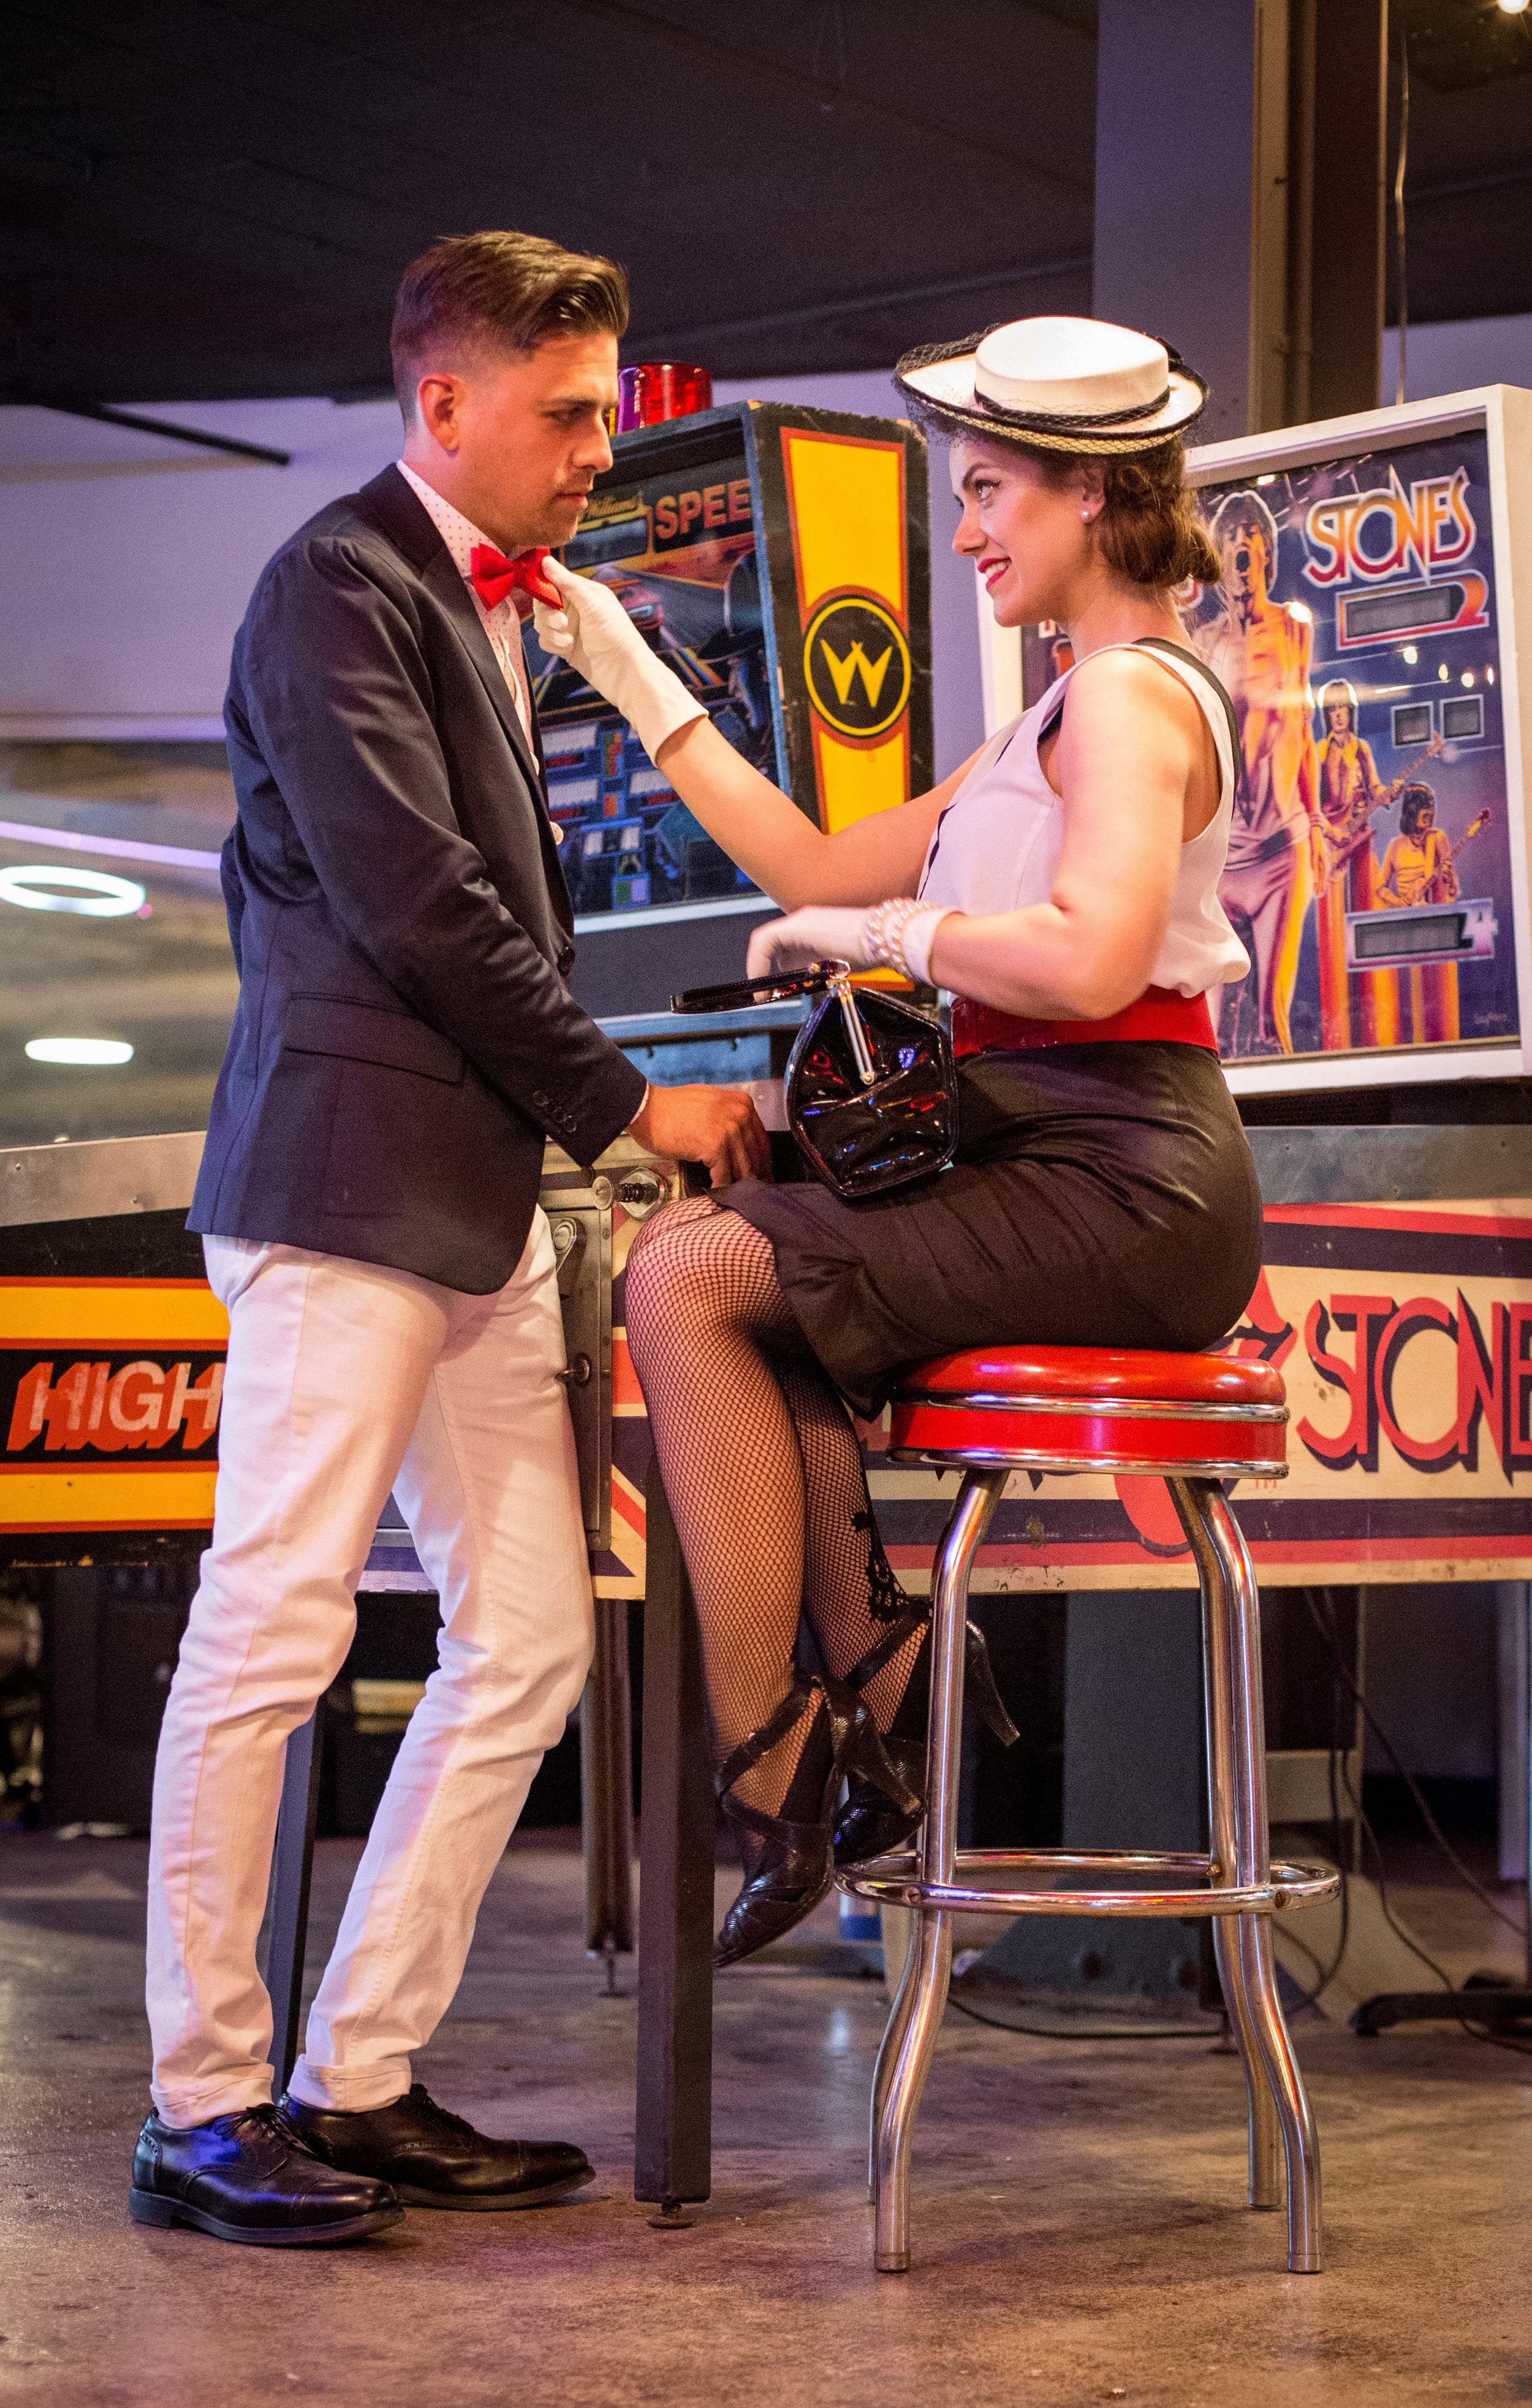 78th St Studio Pinball Arcade